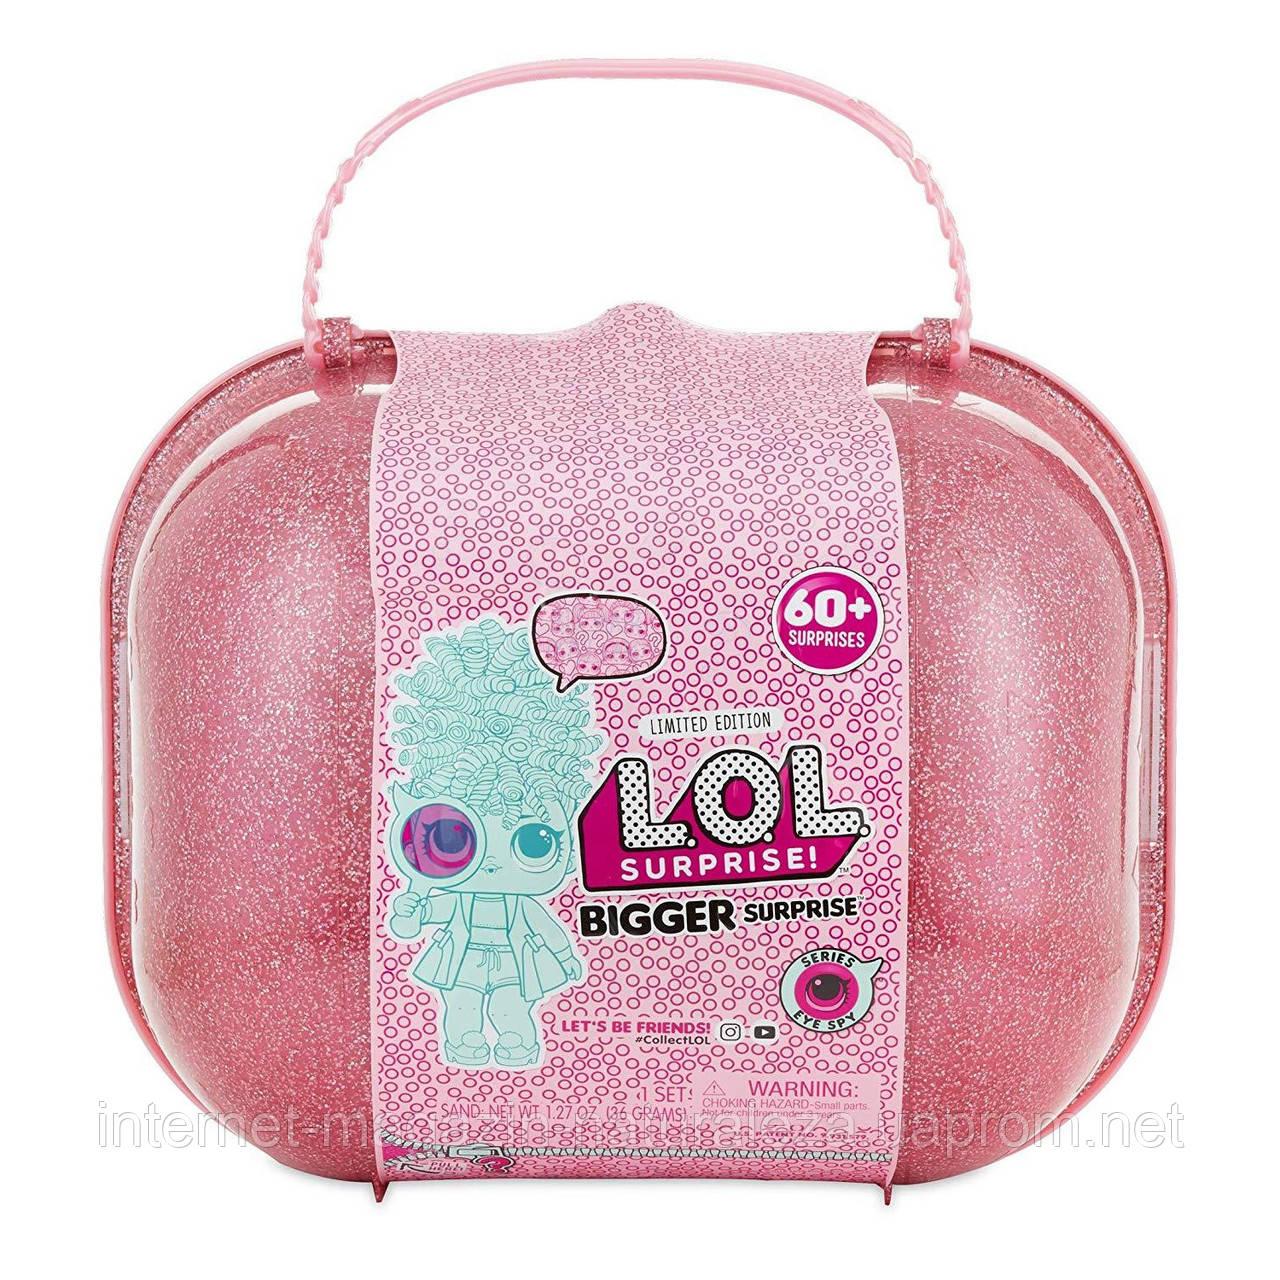 Лол Мега-сюрприз чемодан Lol Bigger Surprise